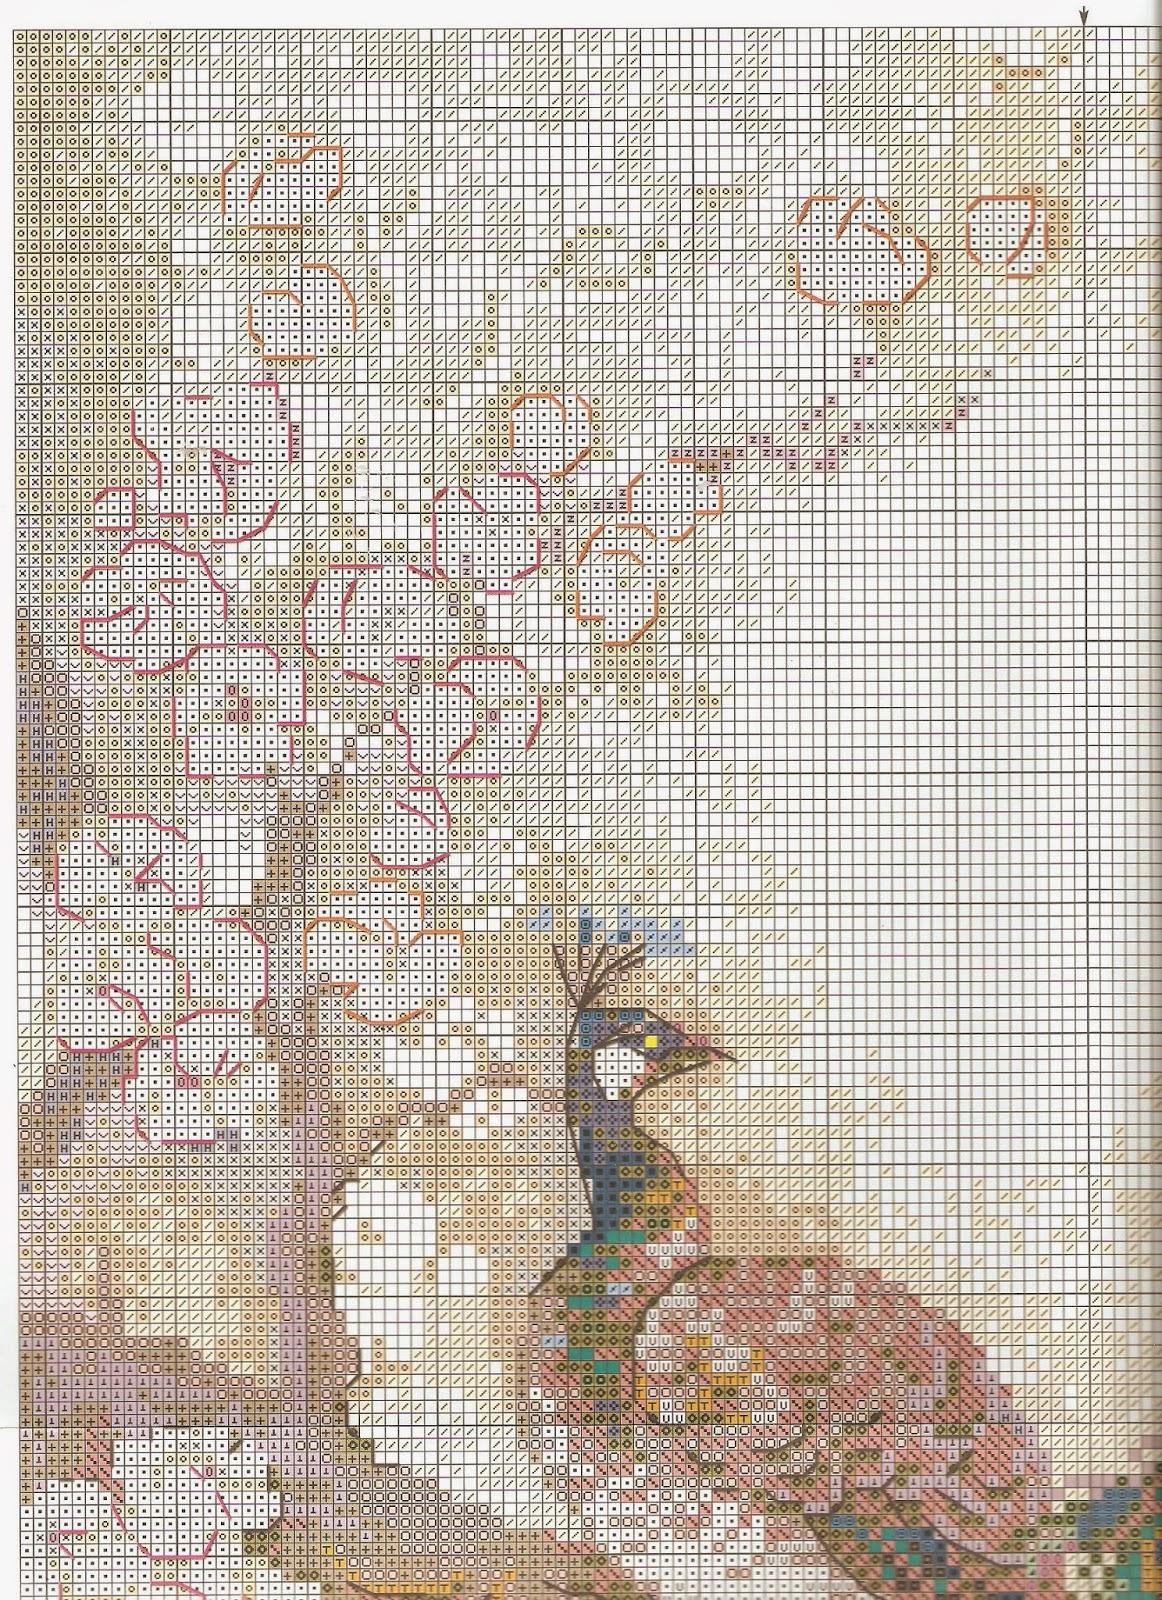 Схема риолис вышивка крестом схема